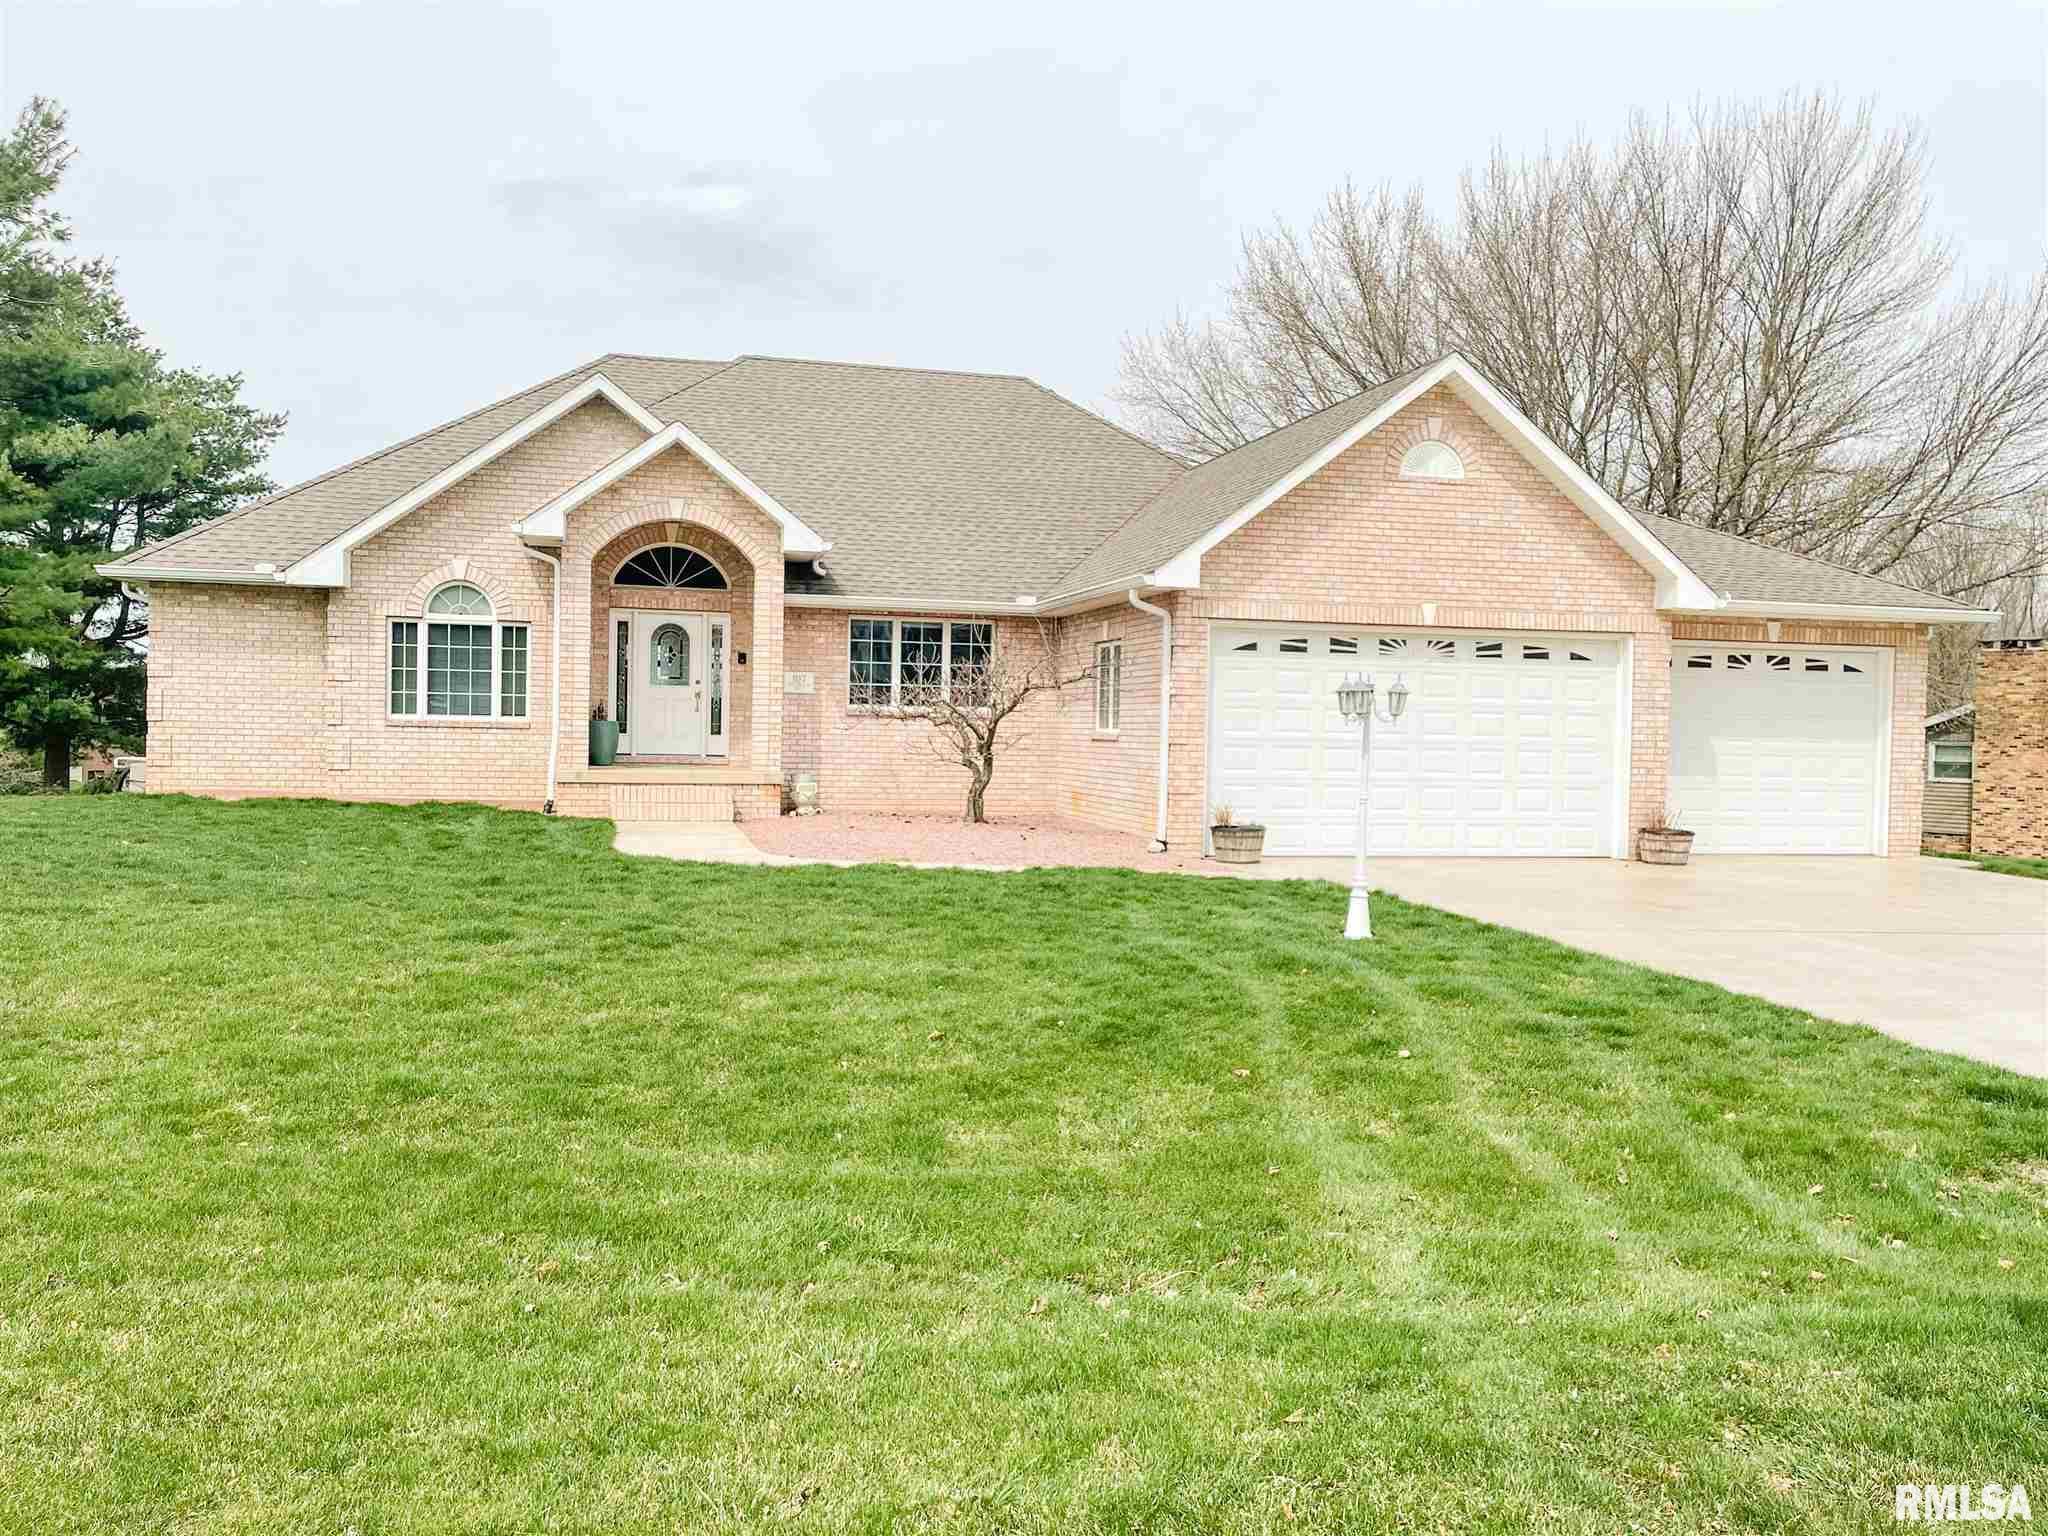 107 COUNTRY LAKE Property Photo - Pekin, IL real estate listing